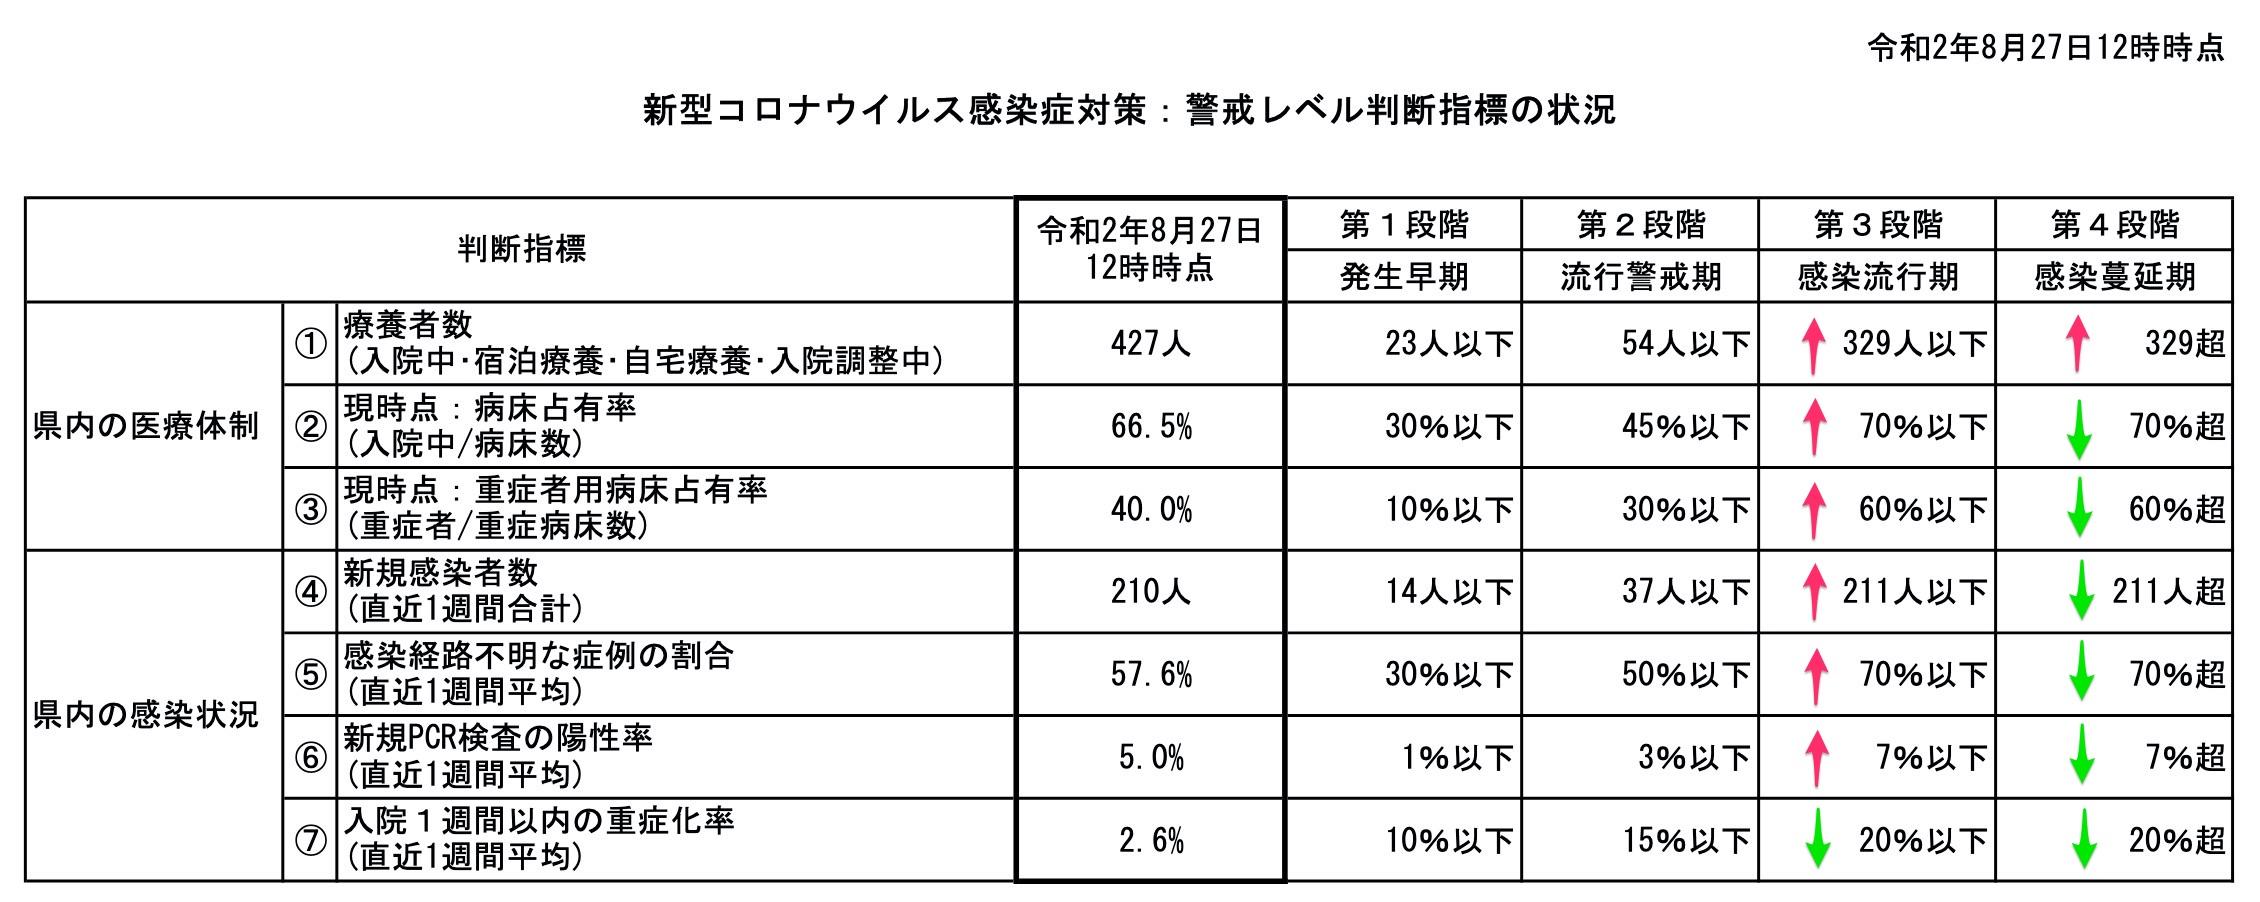 COVID19 standard of Okinawa on 27 Aug